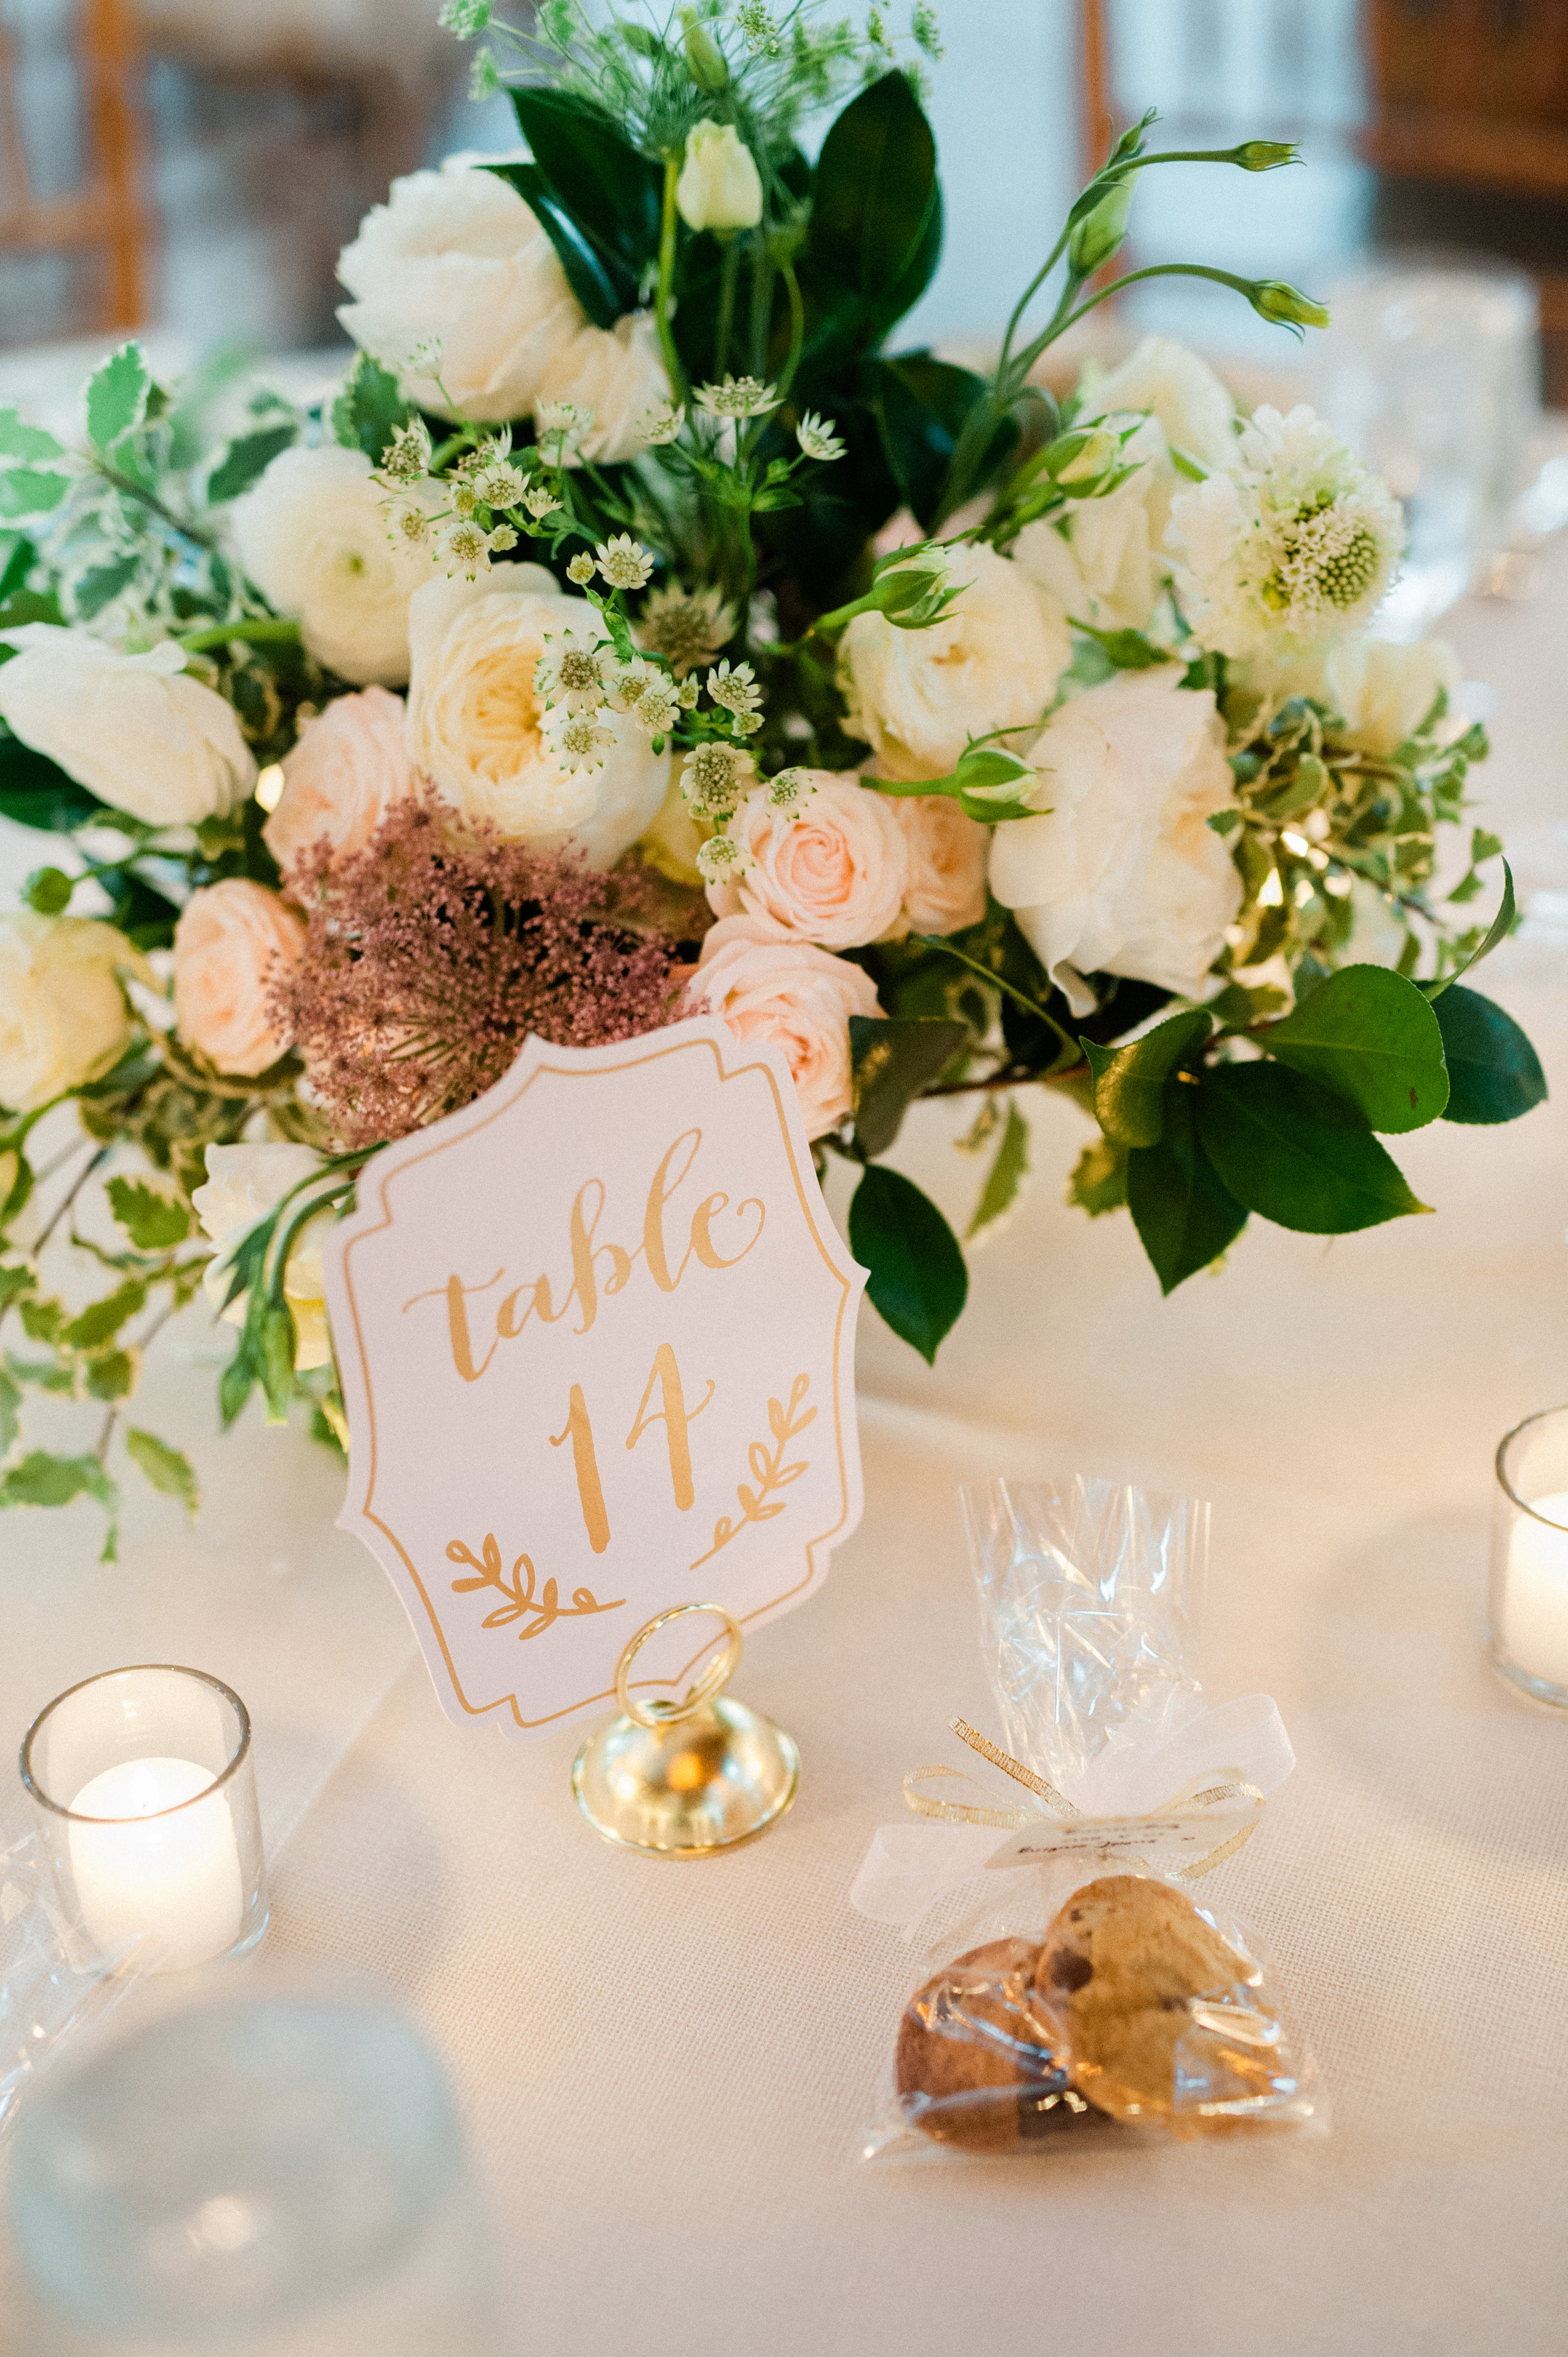 ASHLEYCOXPHOTOGRAPHY_MOLLIE_BRANDON_WEDDING-100 (1).jpg